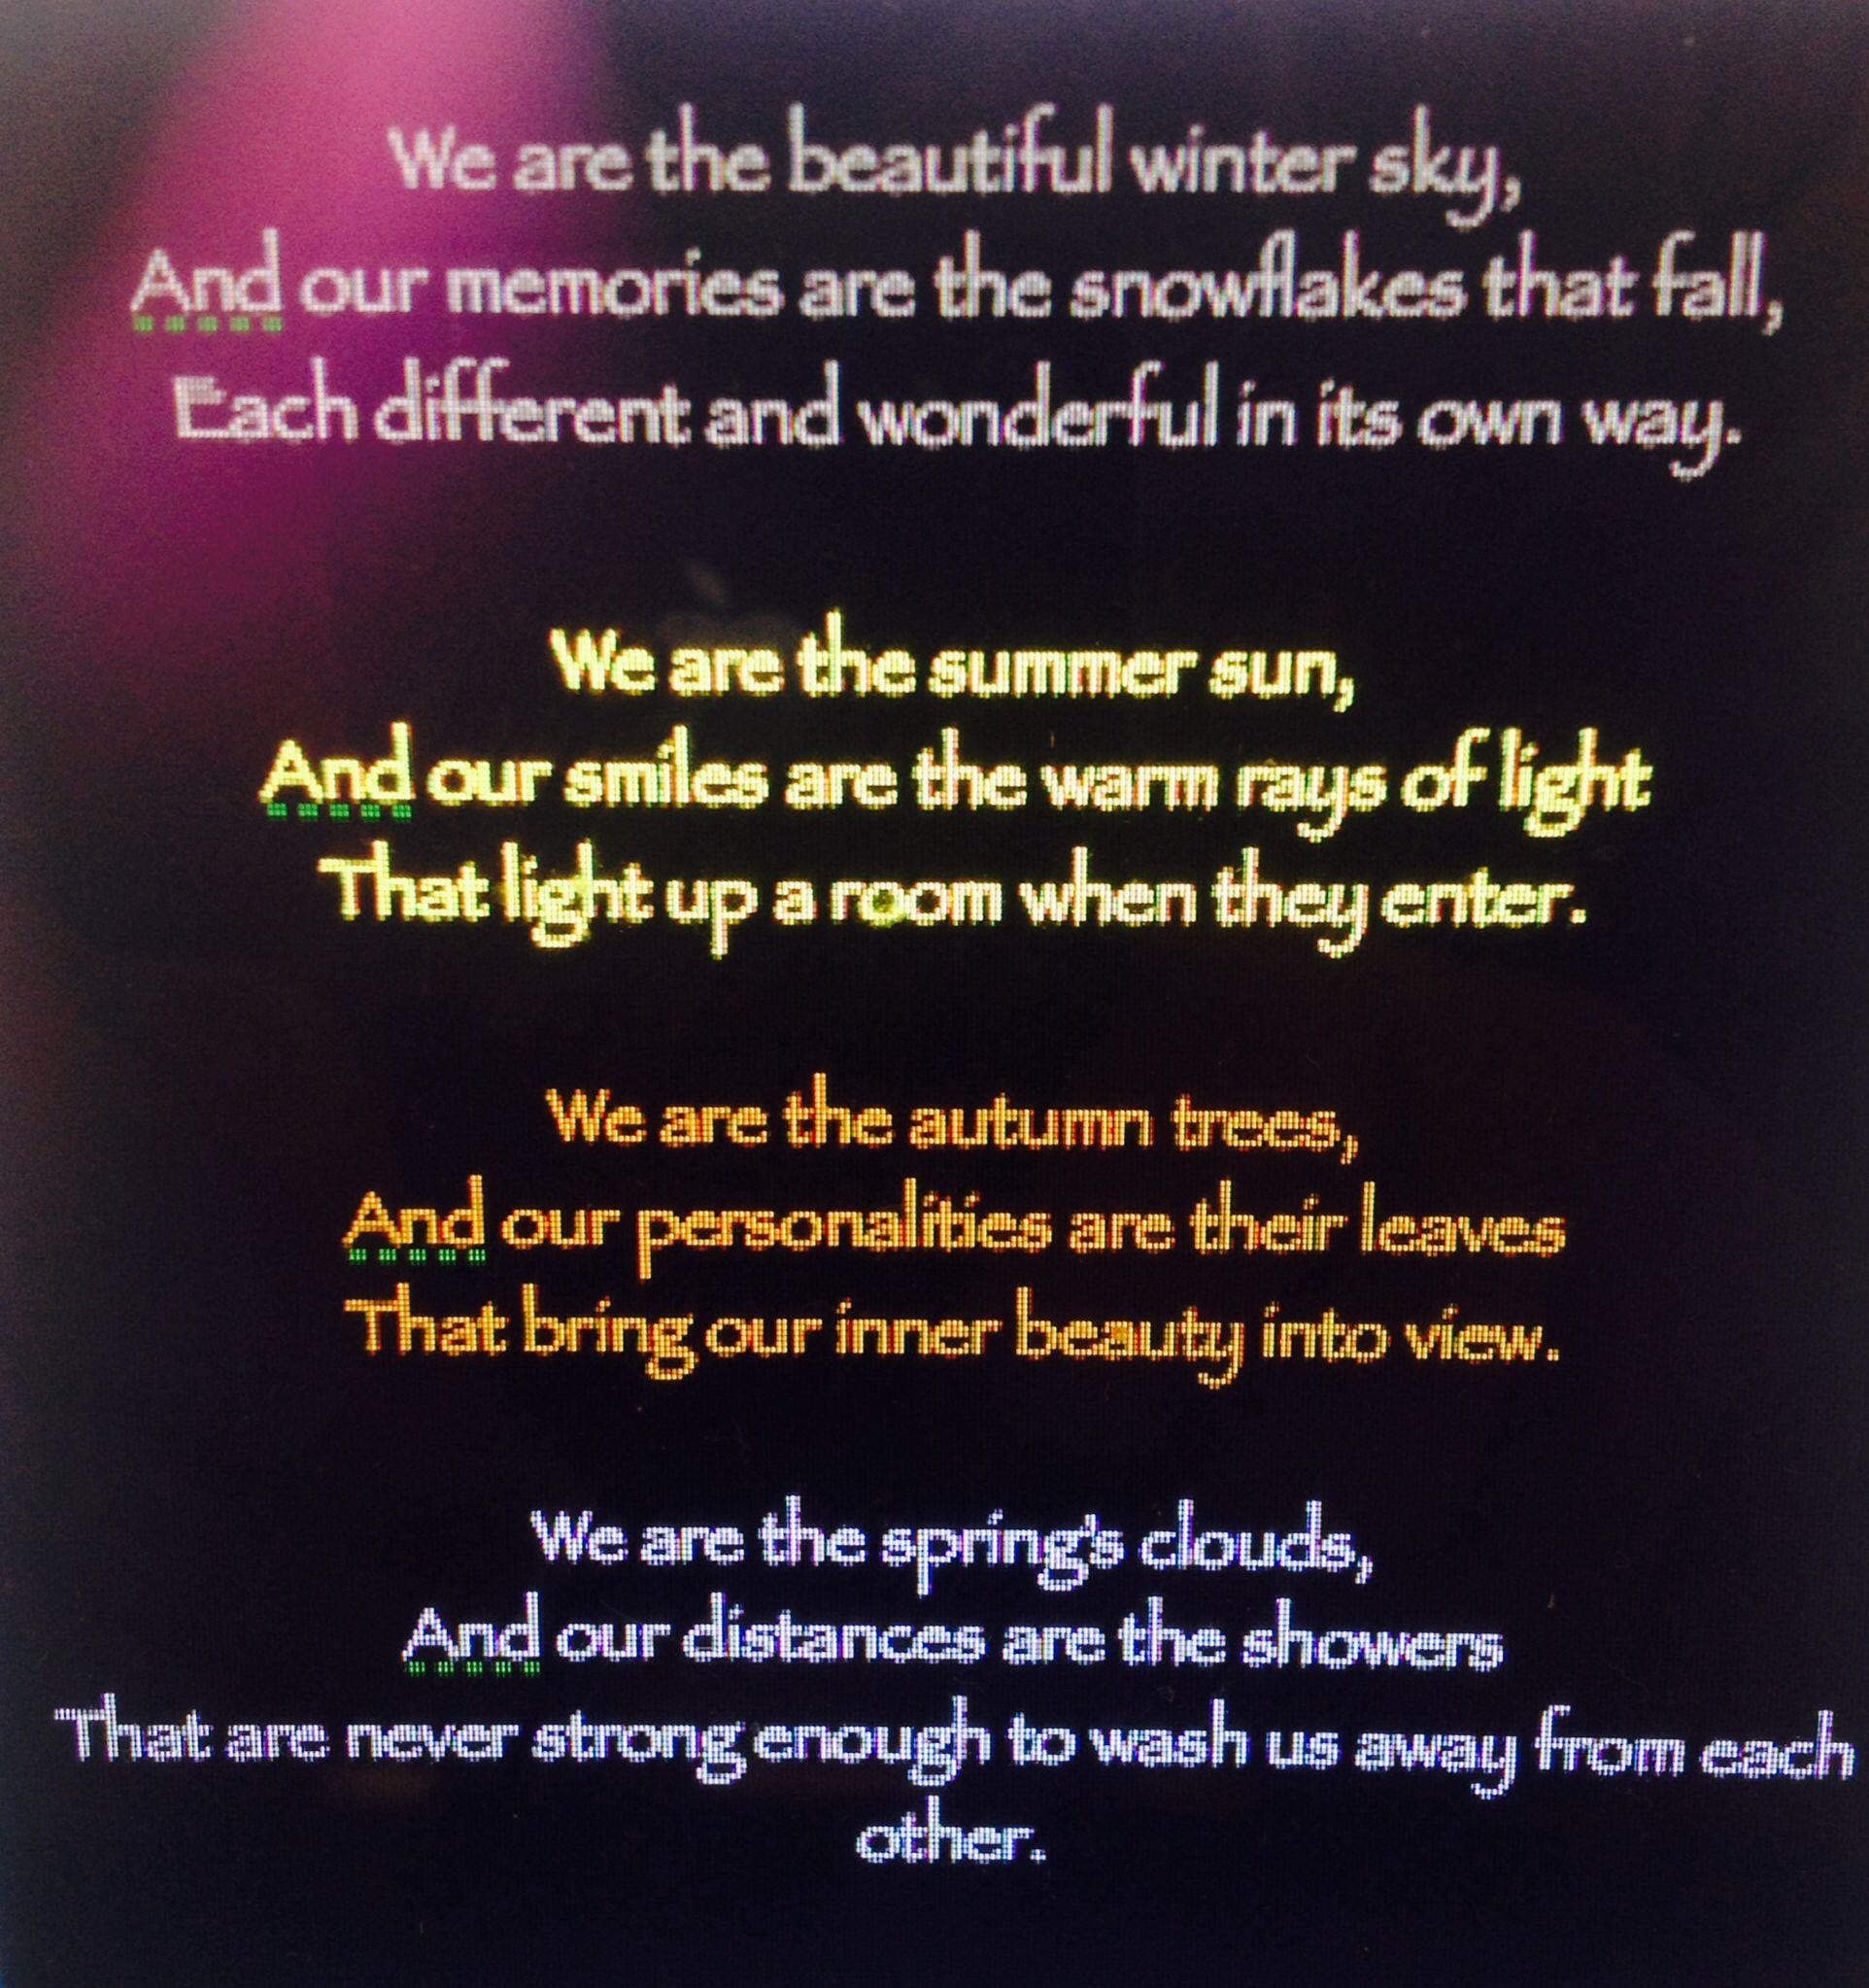 Seasons greetings by me unconventional poetry Poetry